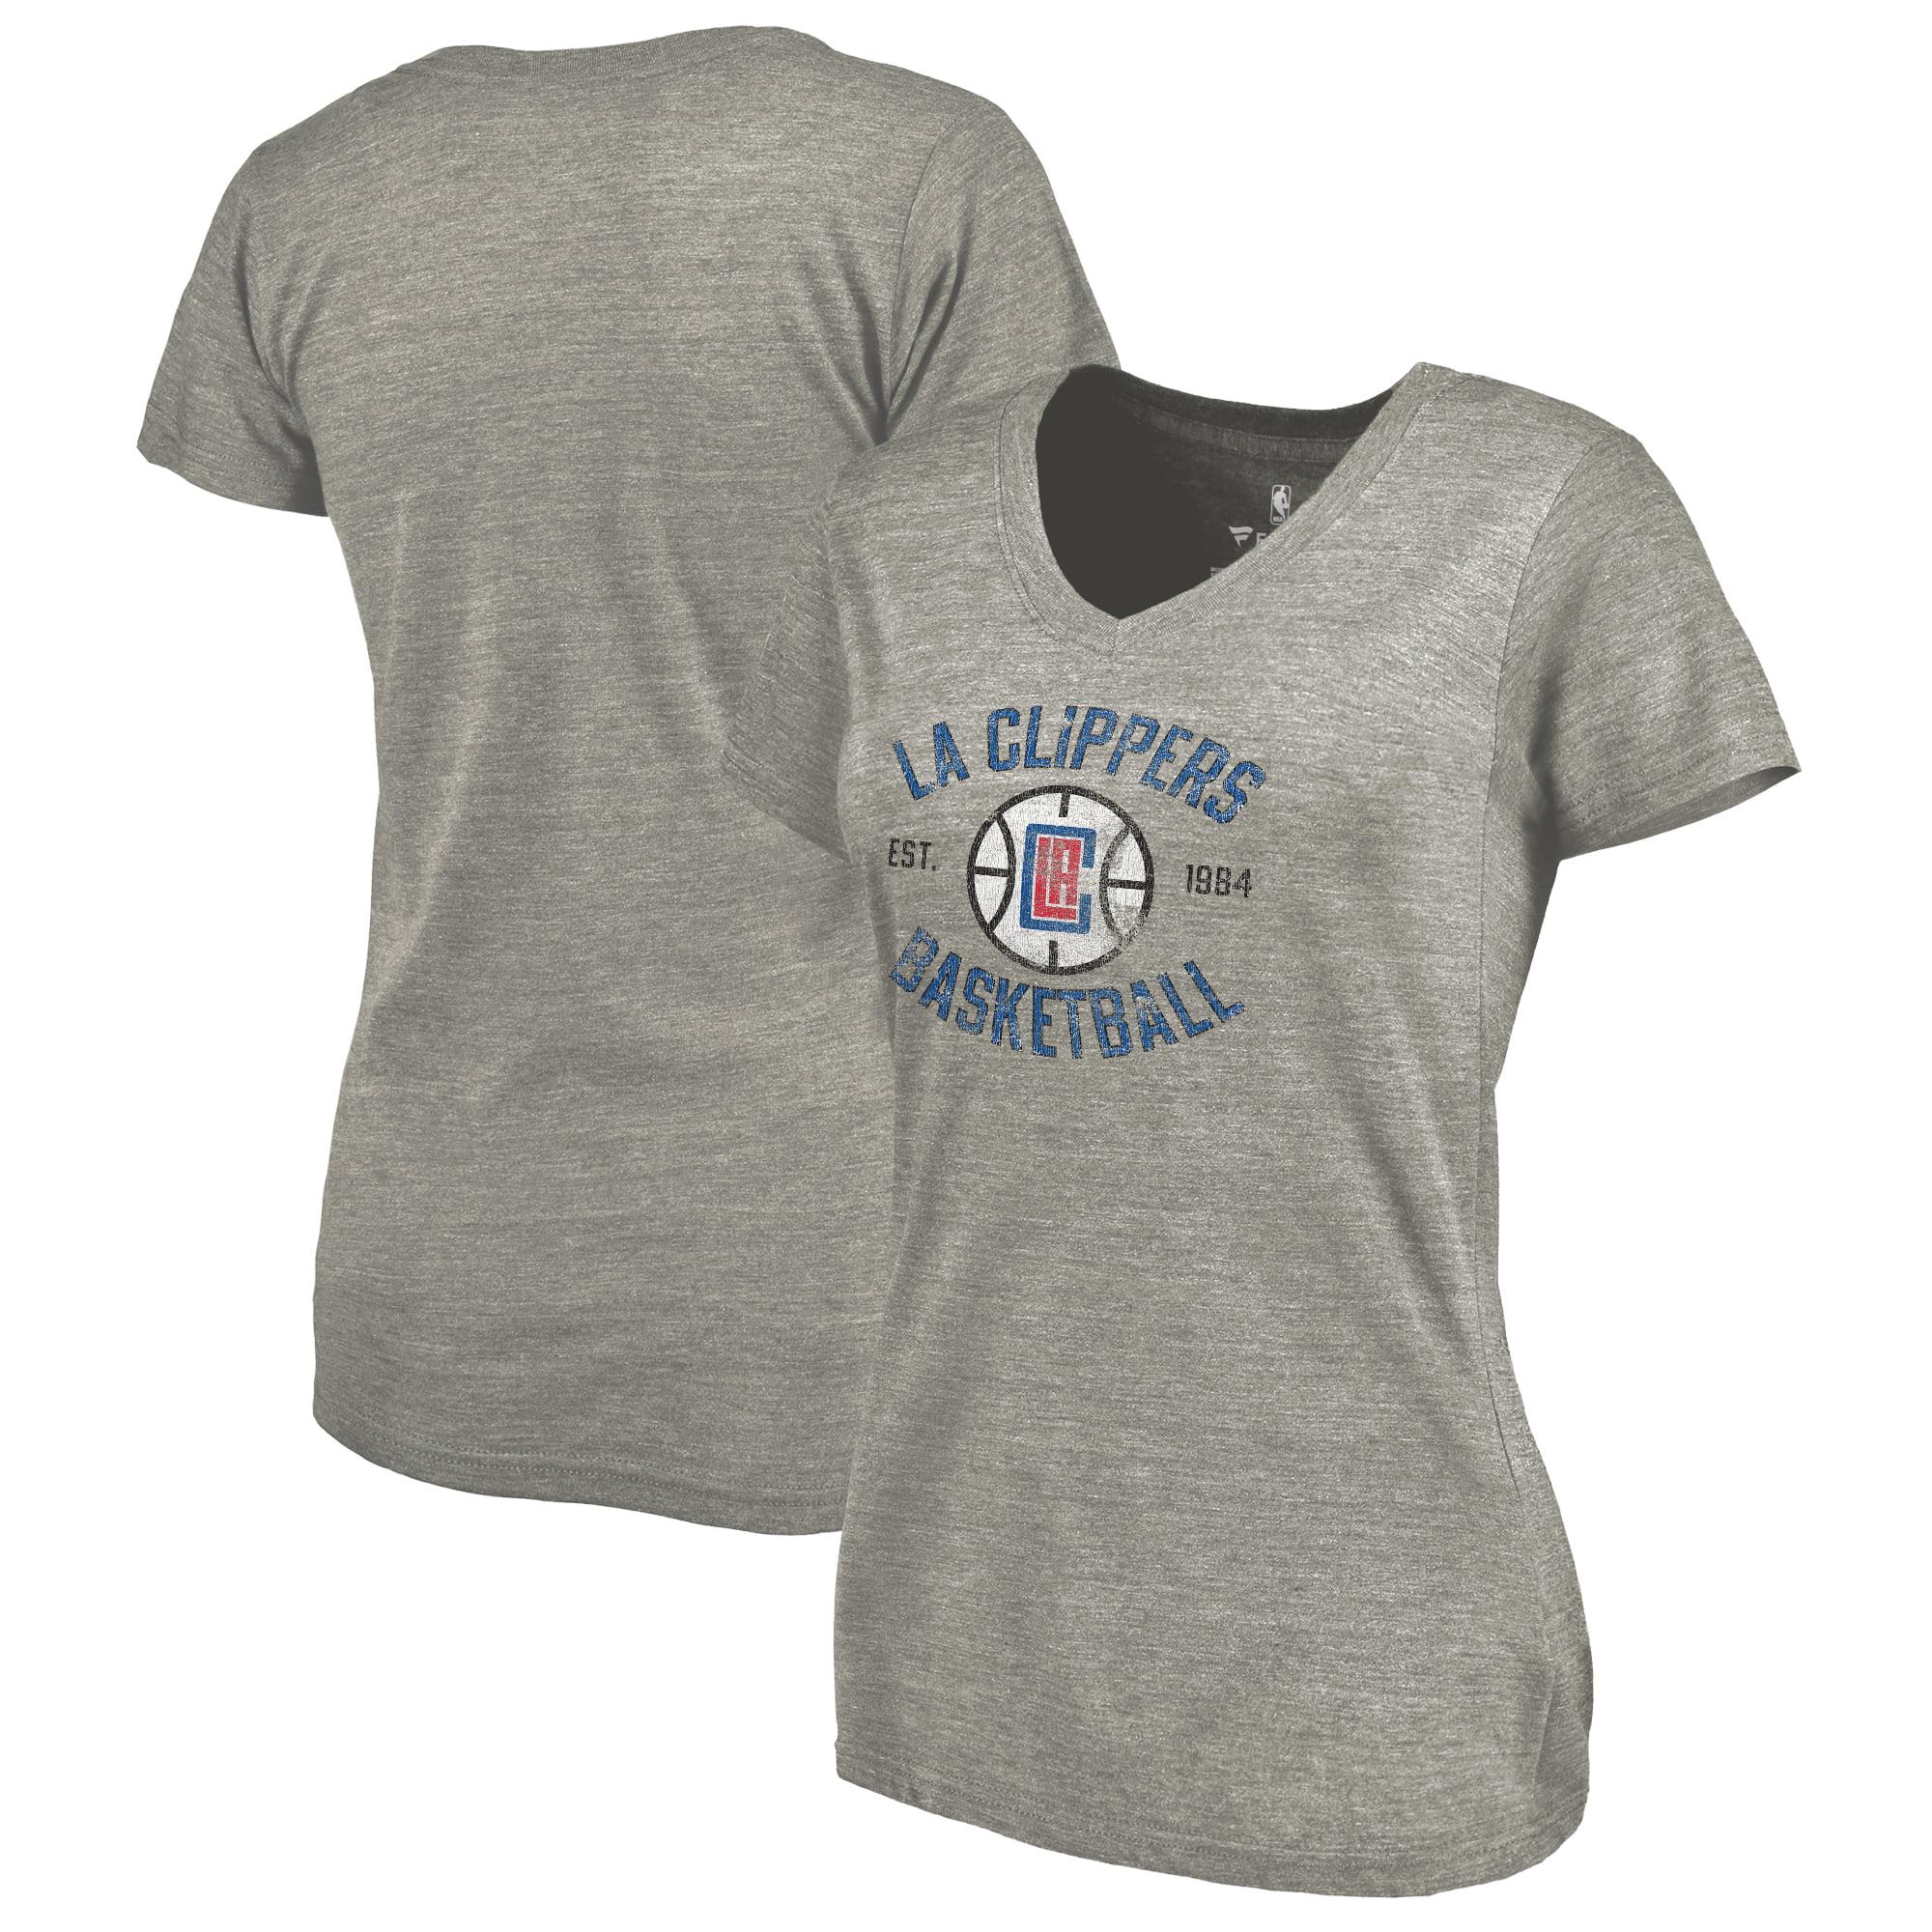 LA Clippers Fanatics Branded Women's Heritage Tri-Blend V-Neck T-Shirt - Heathered Gray